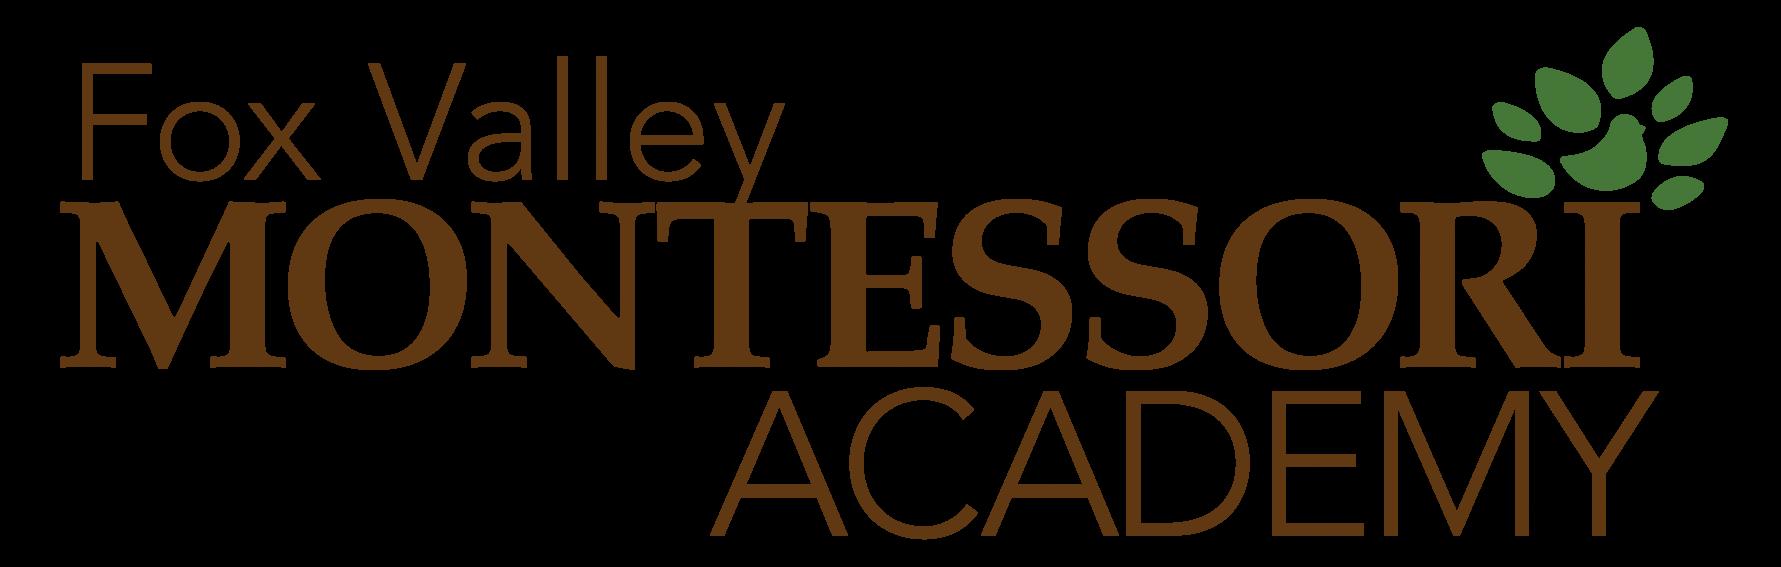 Fox Valley Montessori Academy